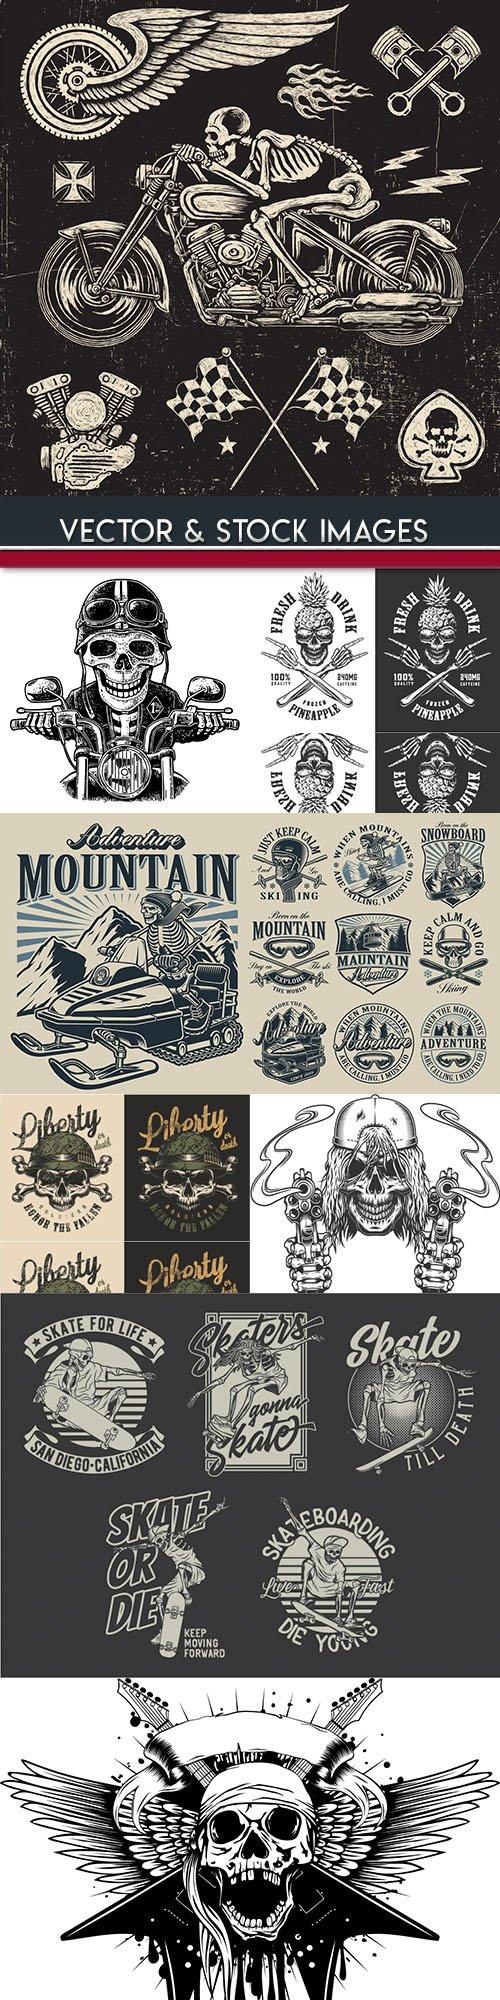 Skull and accessories grunge label drawn design 8